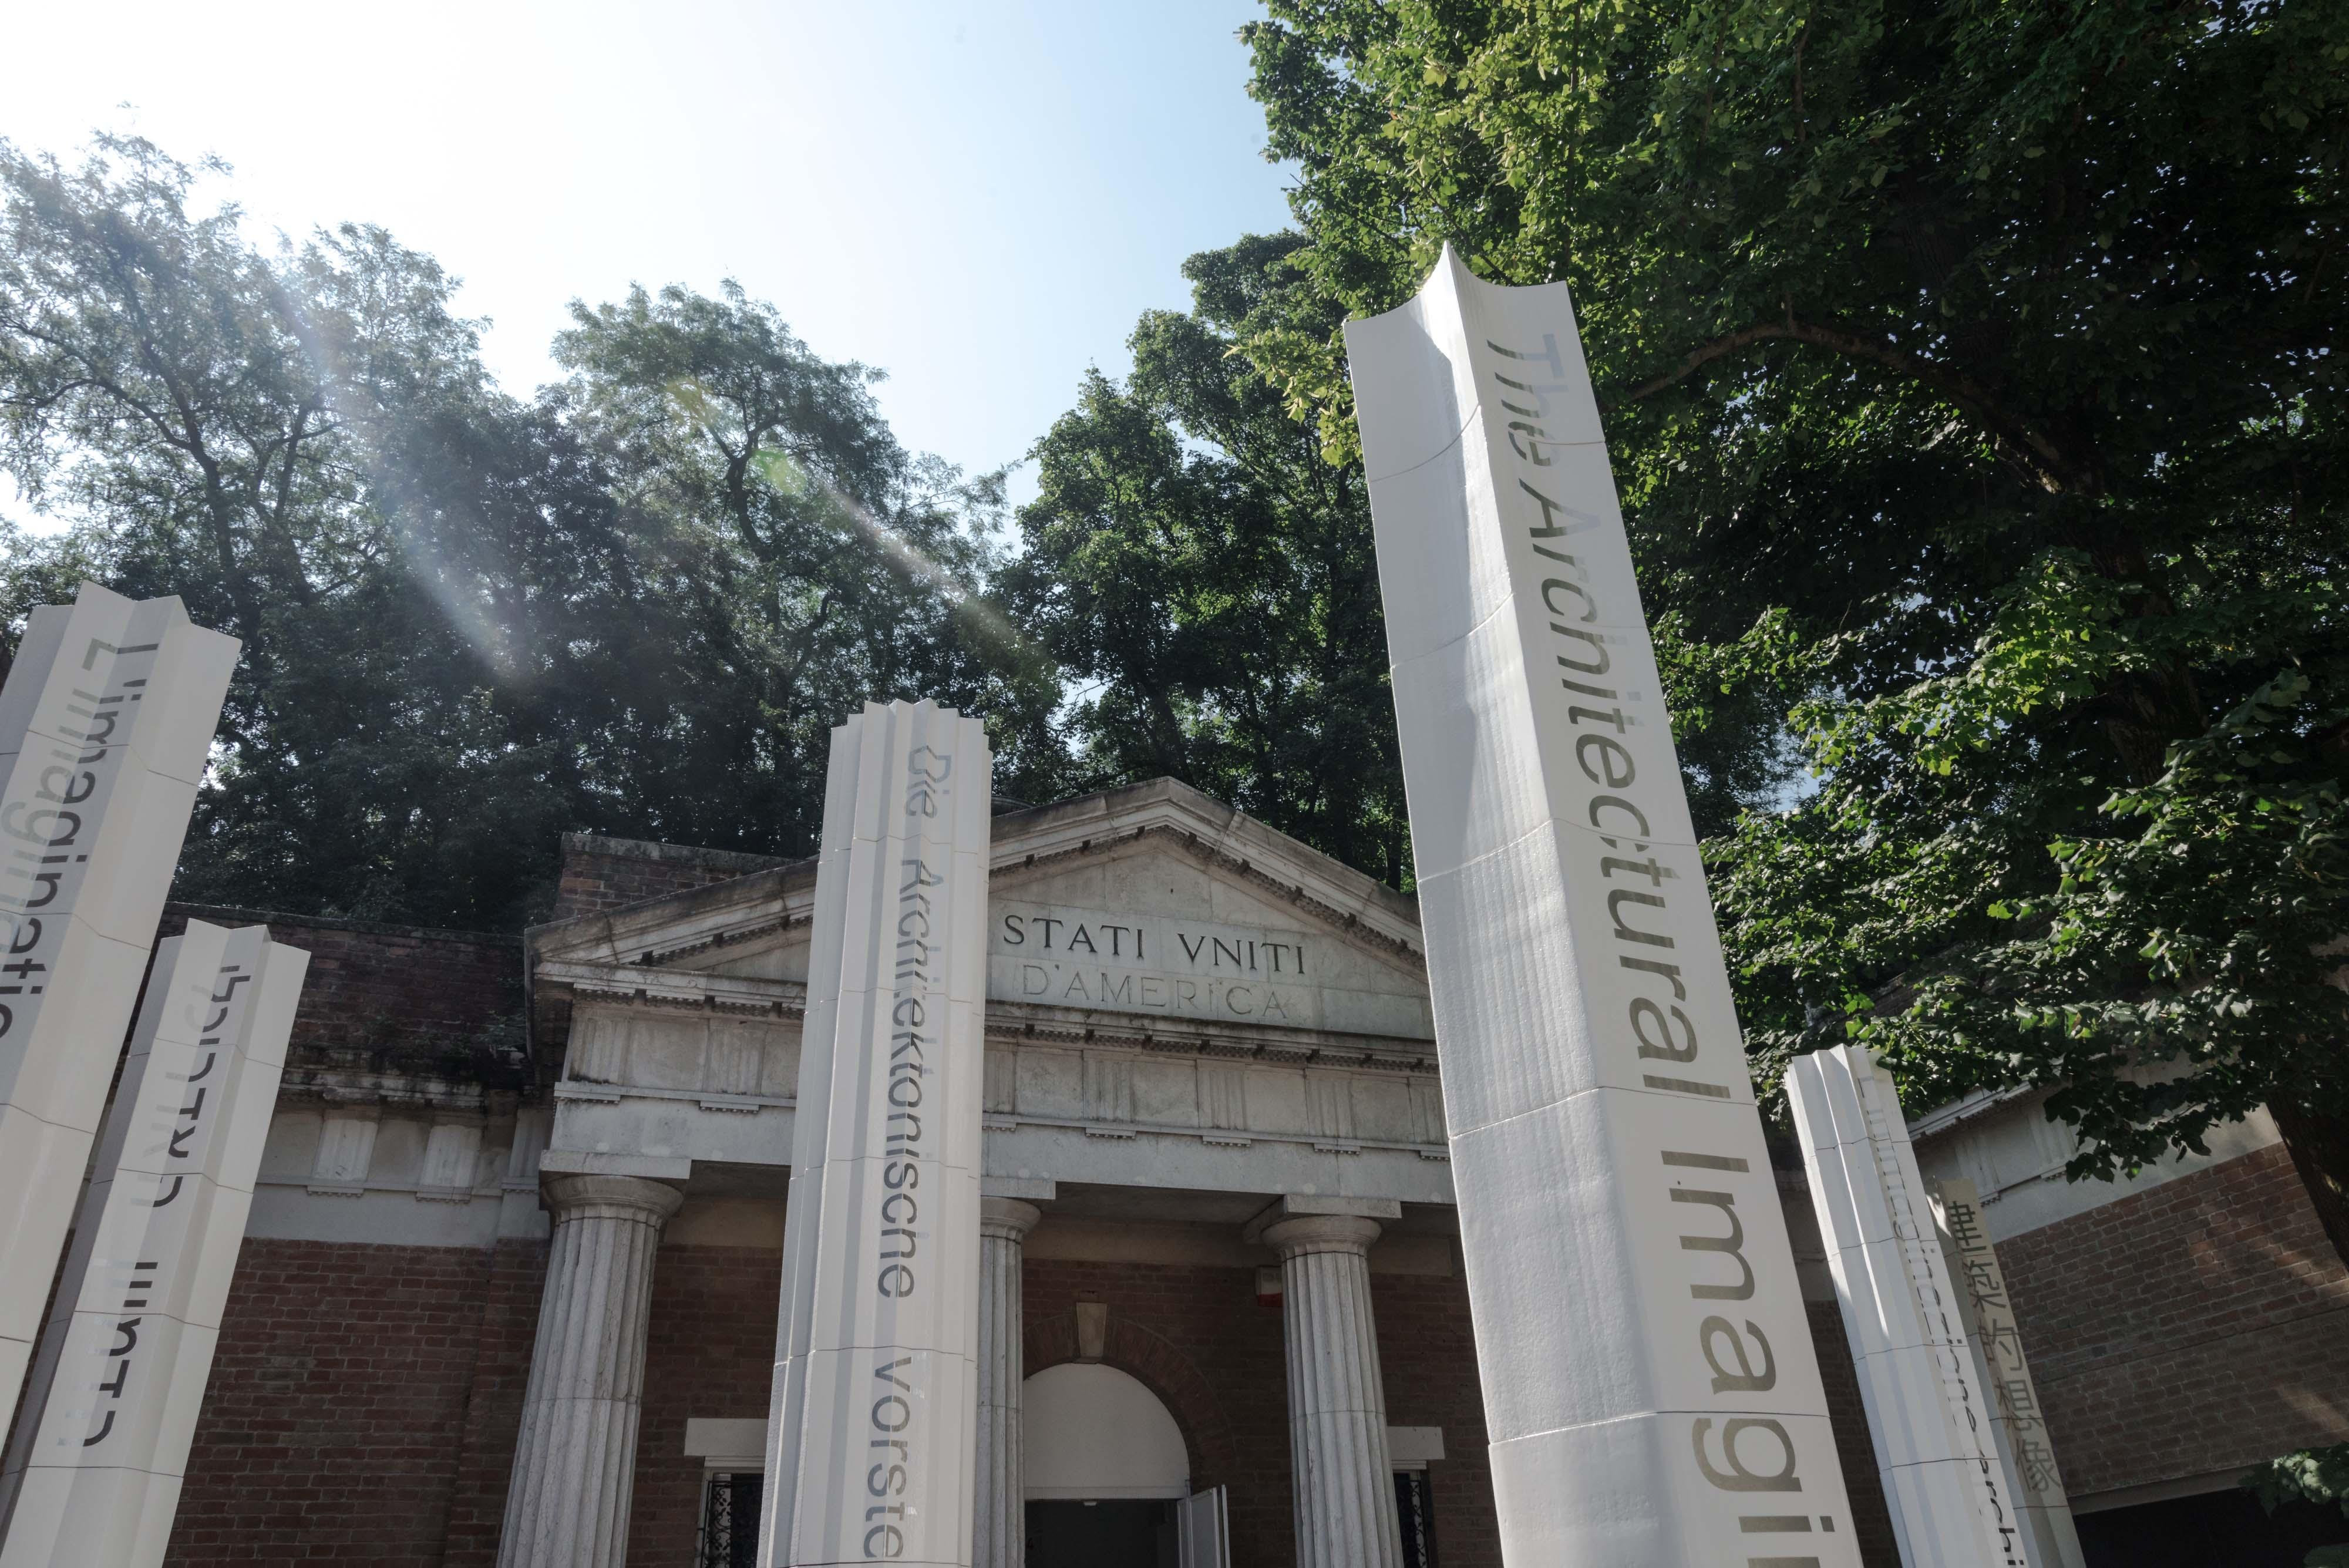 Venice Biennale U S Pavilion Courtyard Installation Mpdl Studio